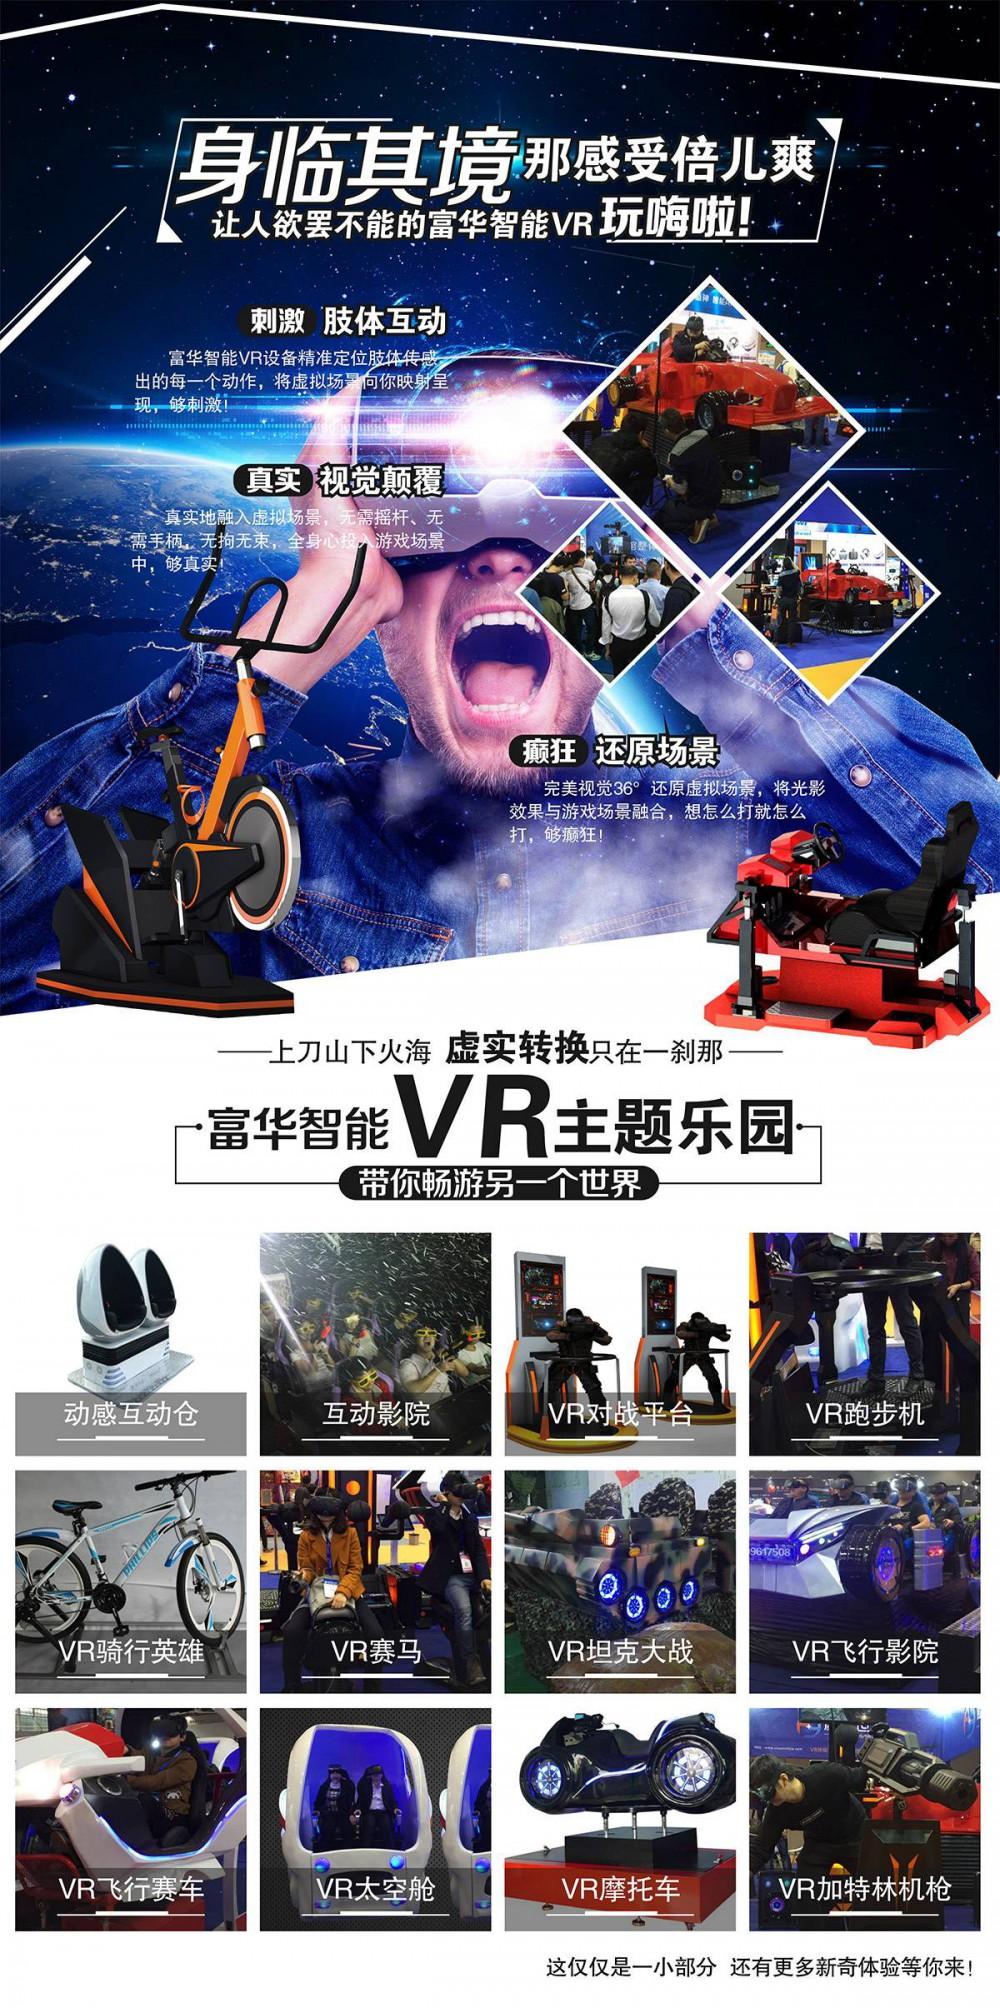 VR主题游乐公园设备玩家点评